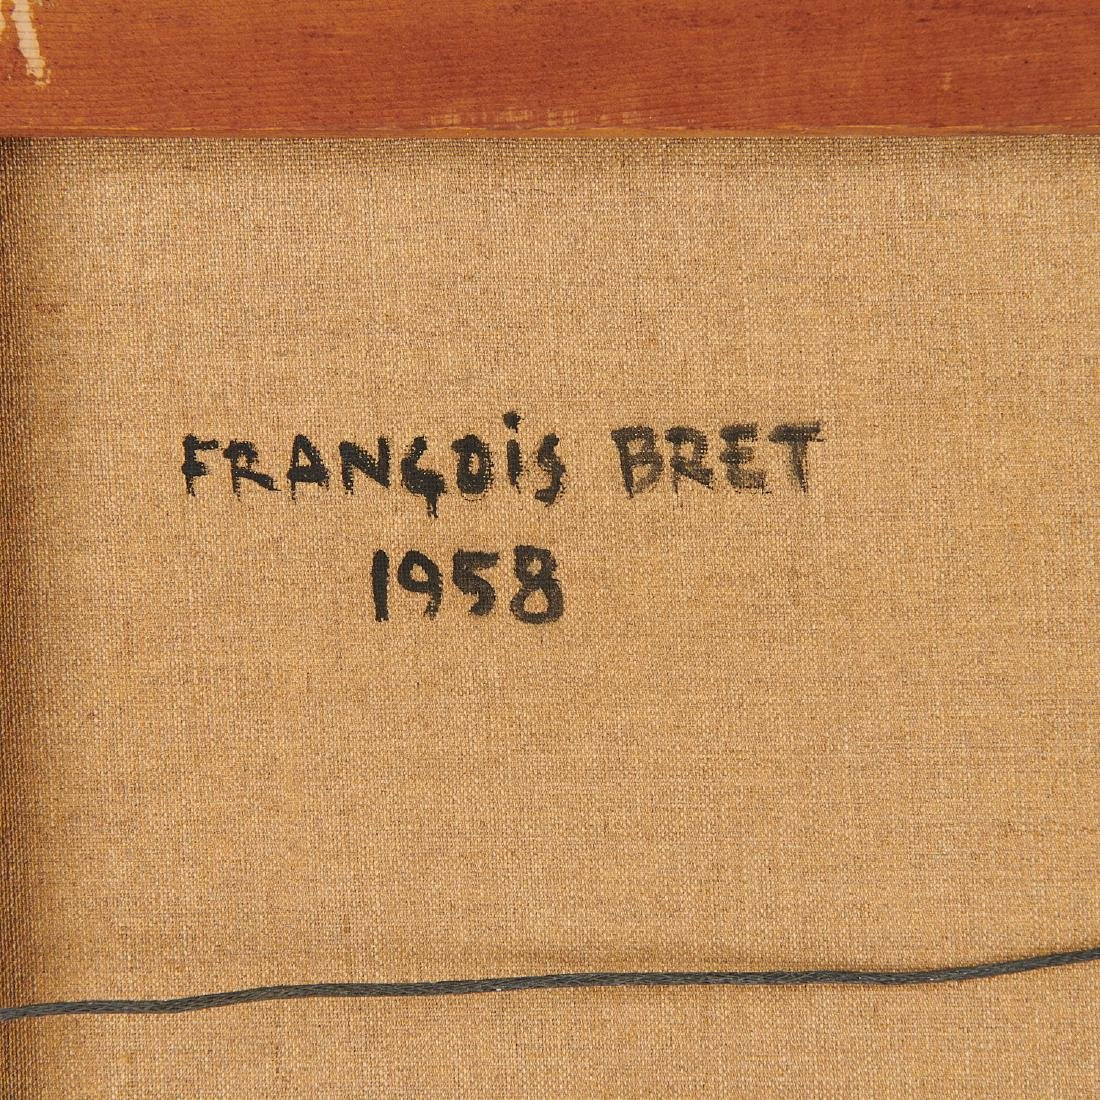 Francois Bret, painting, 1958 - 9